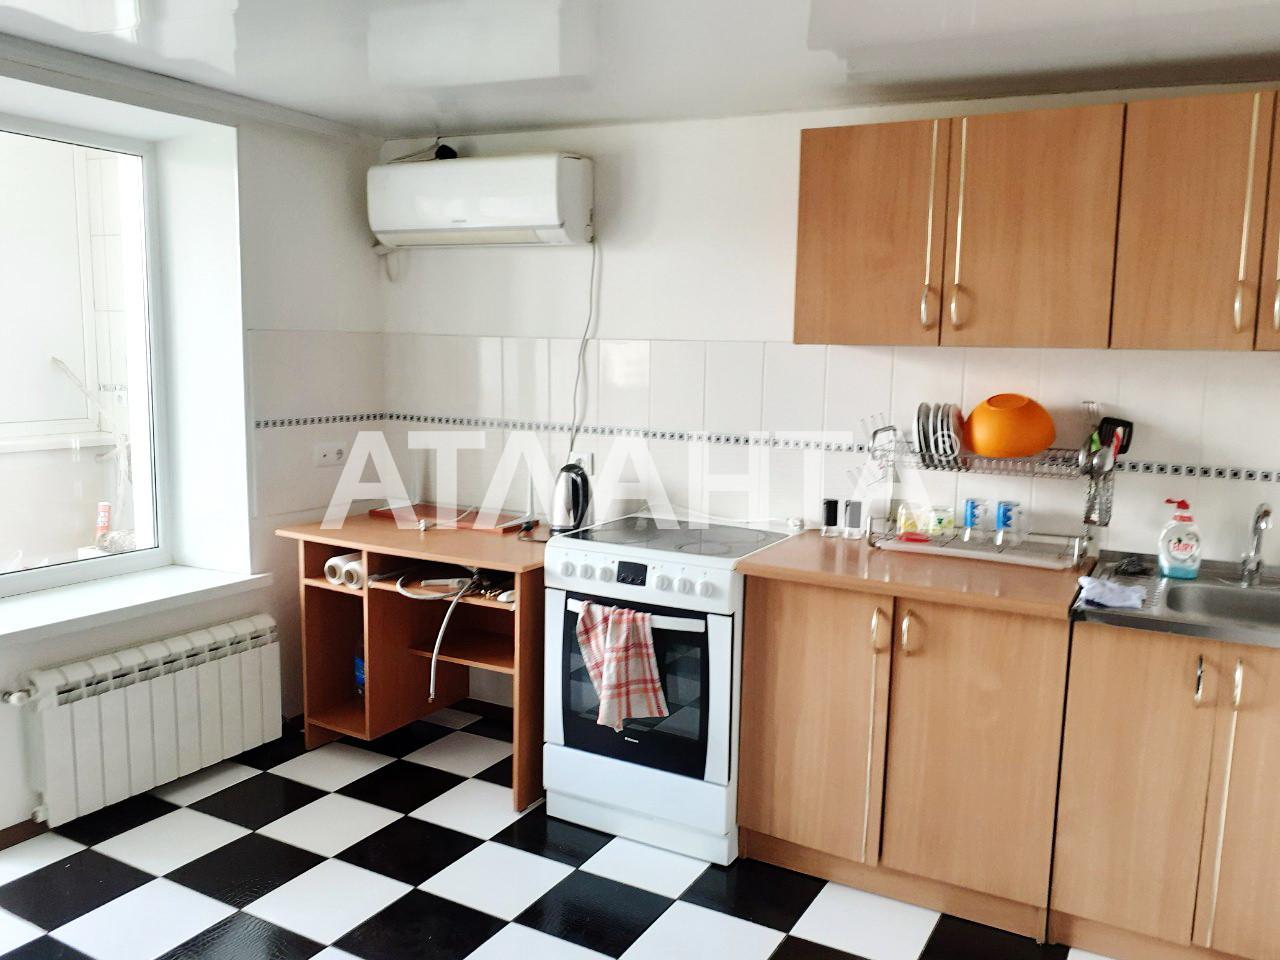 Продается 1-комнатная Квартира на ул. Ядова Сергея (Юбилейная) — 35 000 у.е. (фото №4)